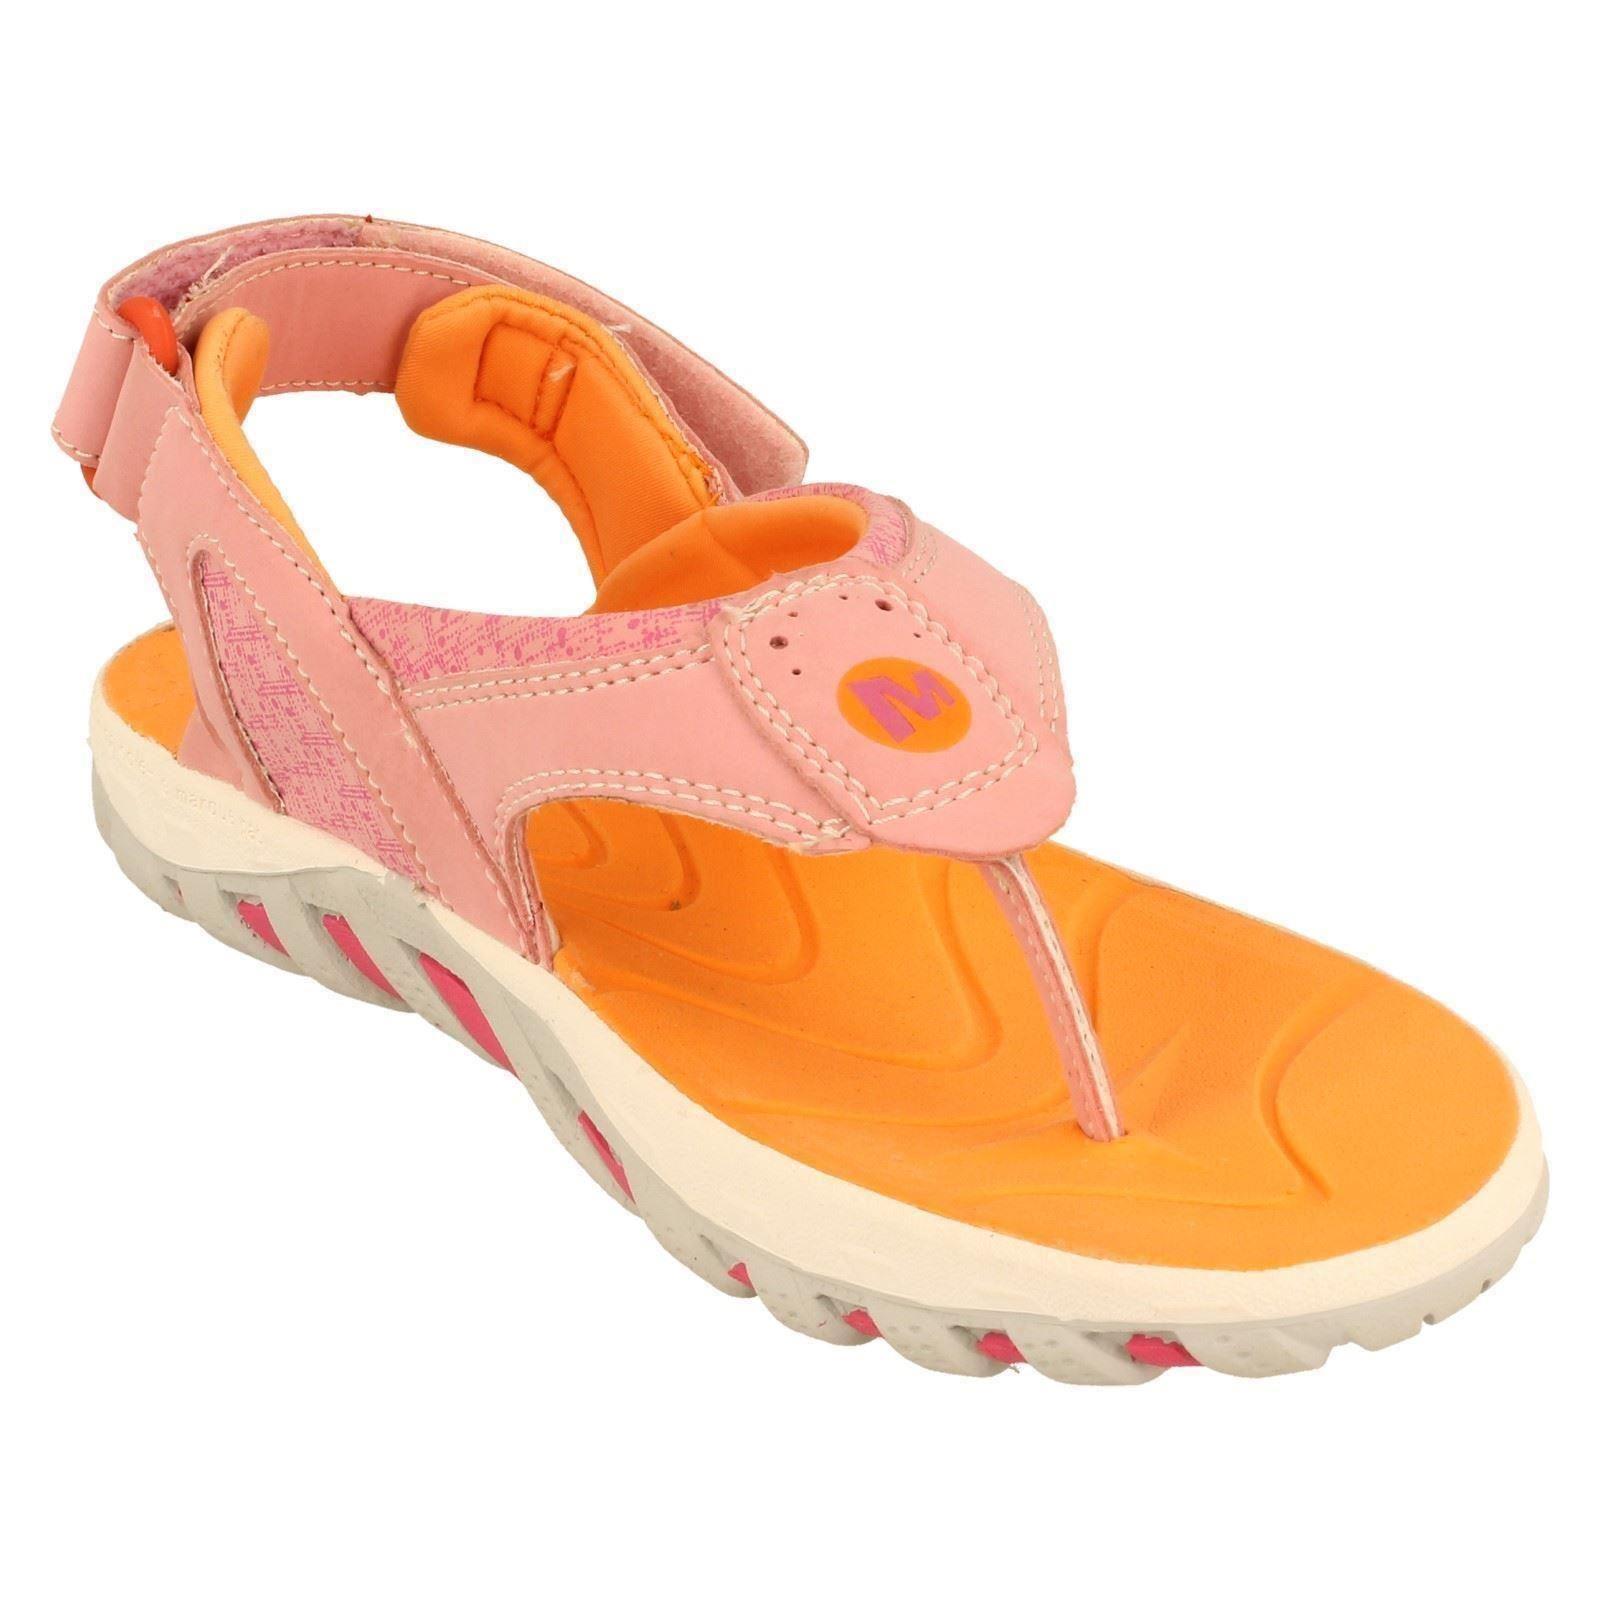 Girls Merrell Sandals Waterpro Plunge Style ~ K